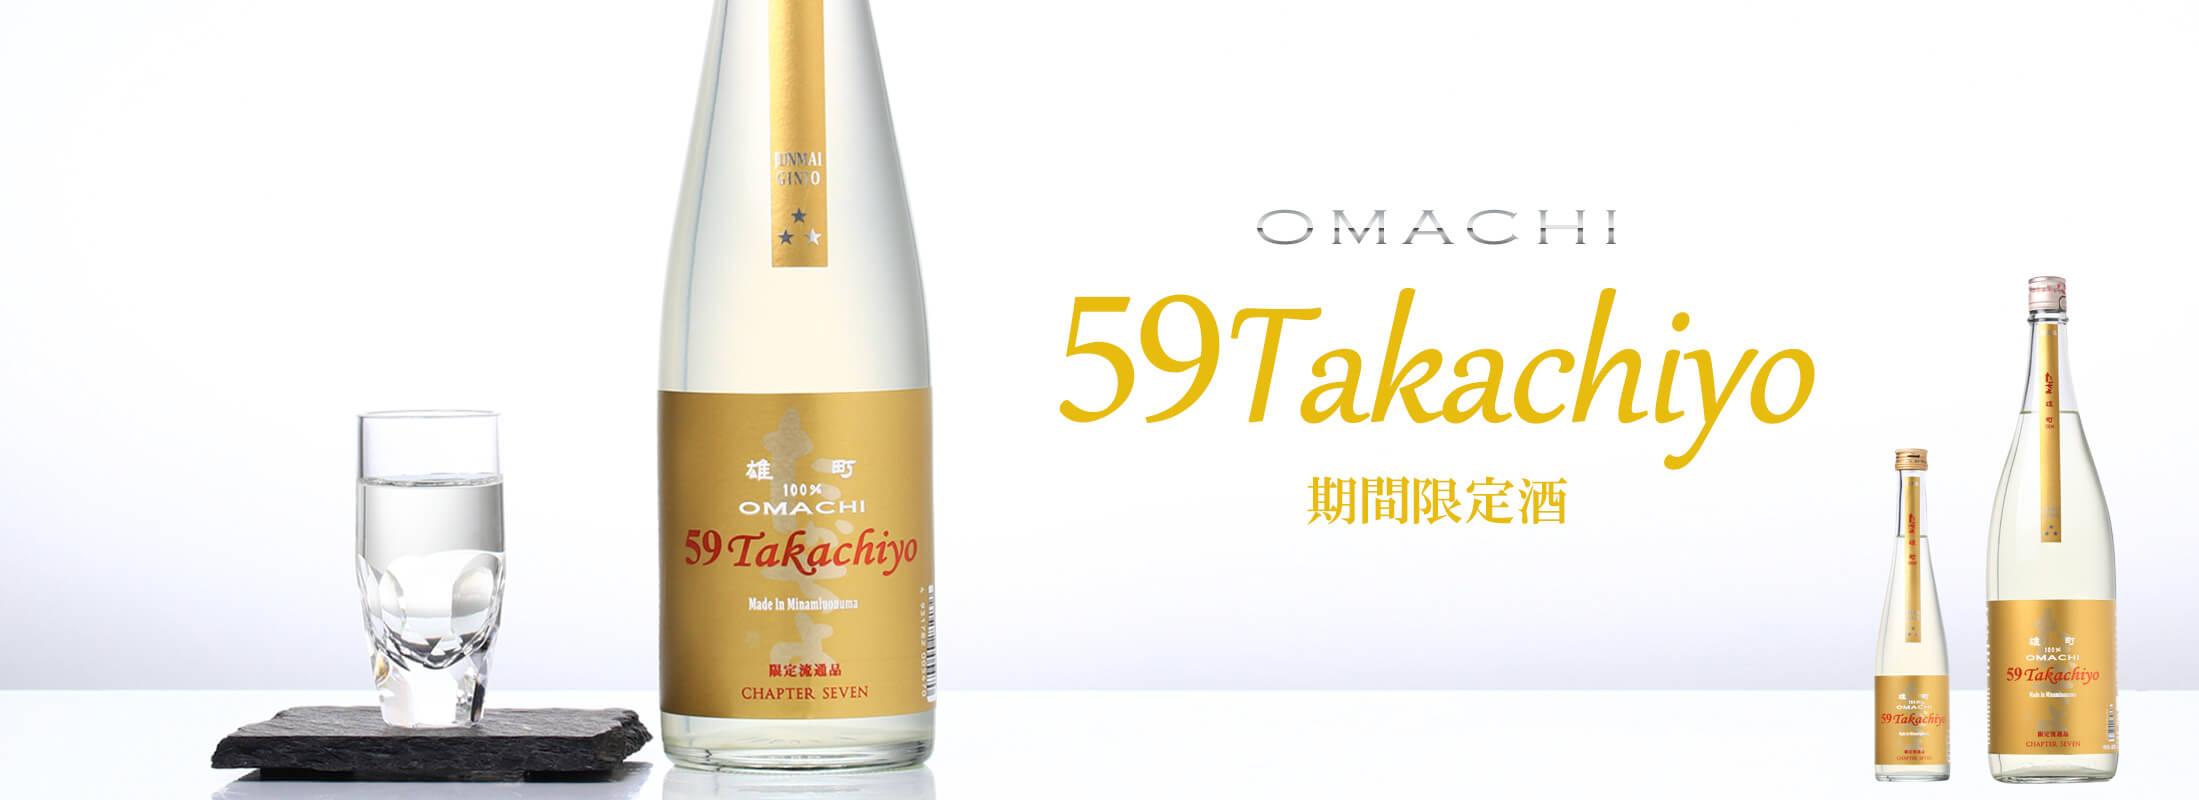 Takachiyo 59(極) 純米吟醸 雄町